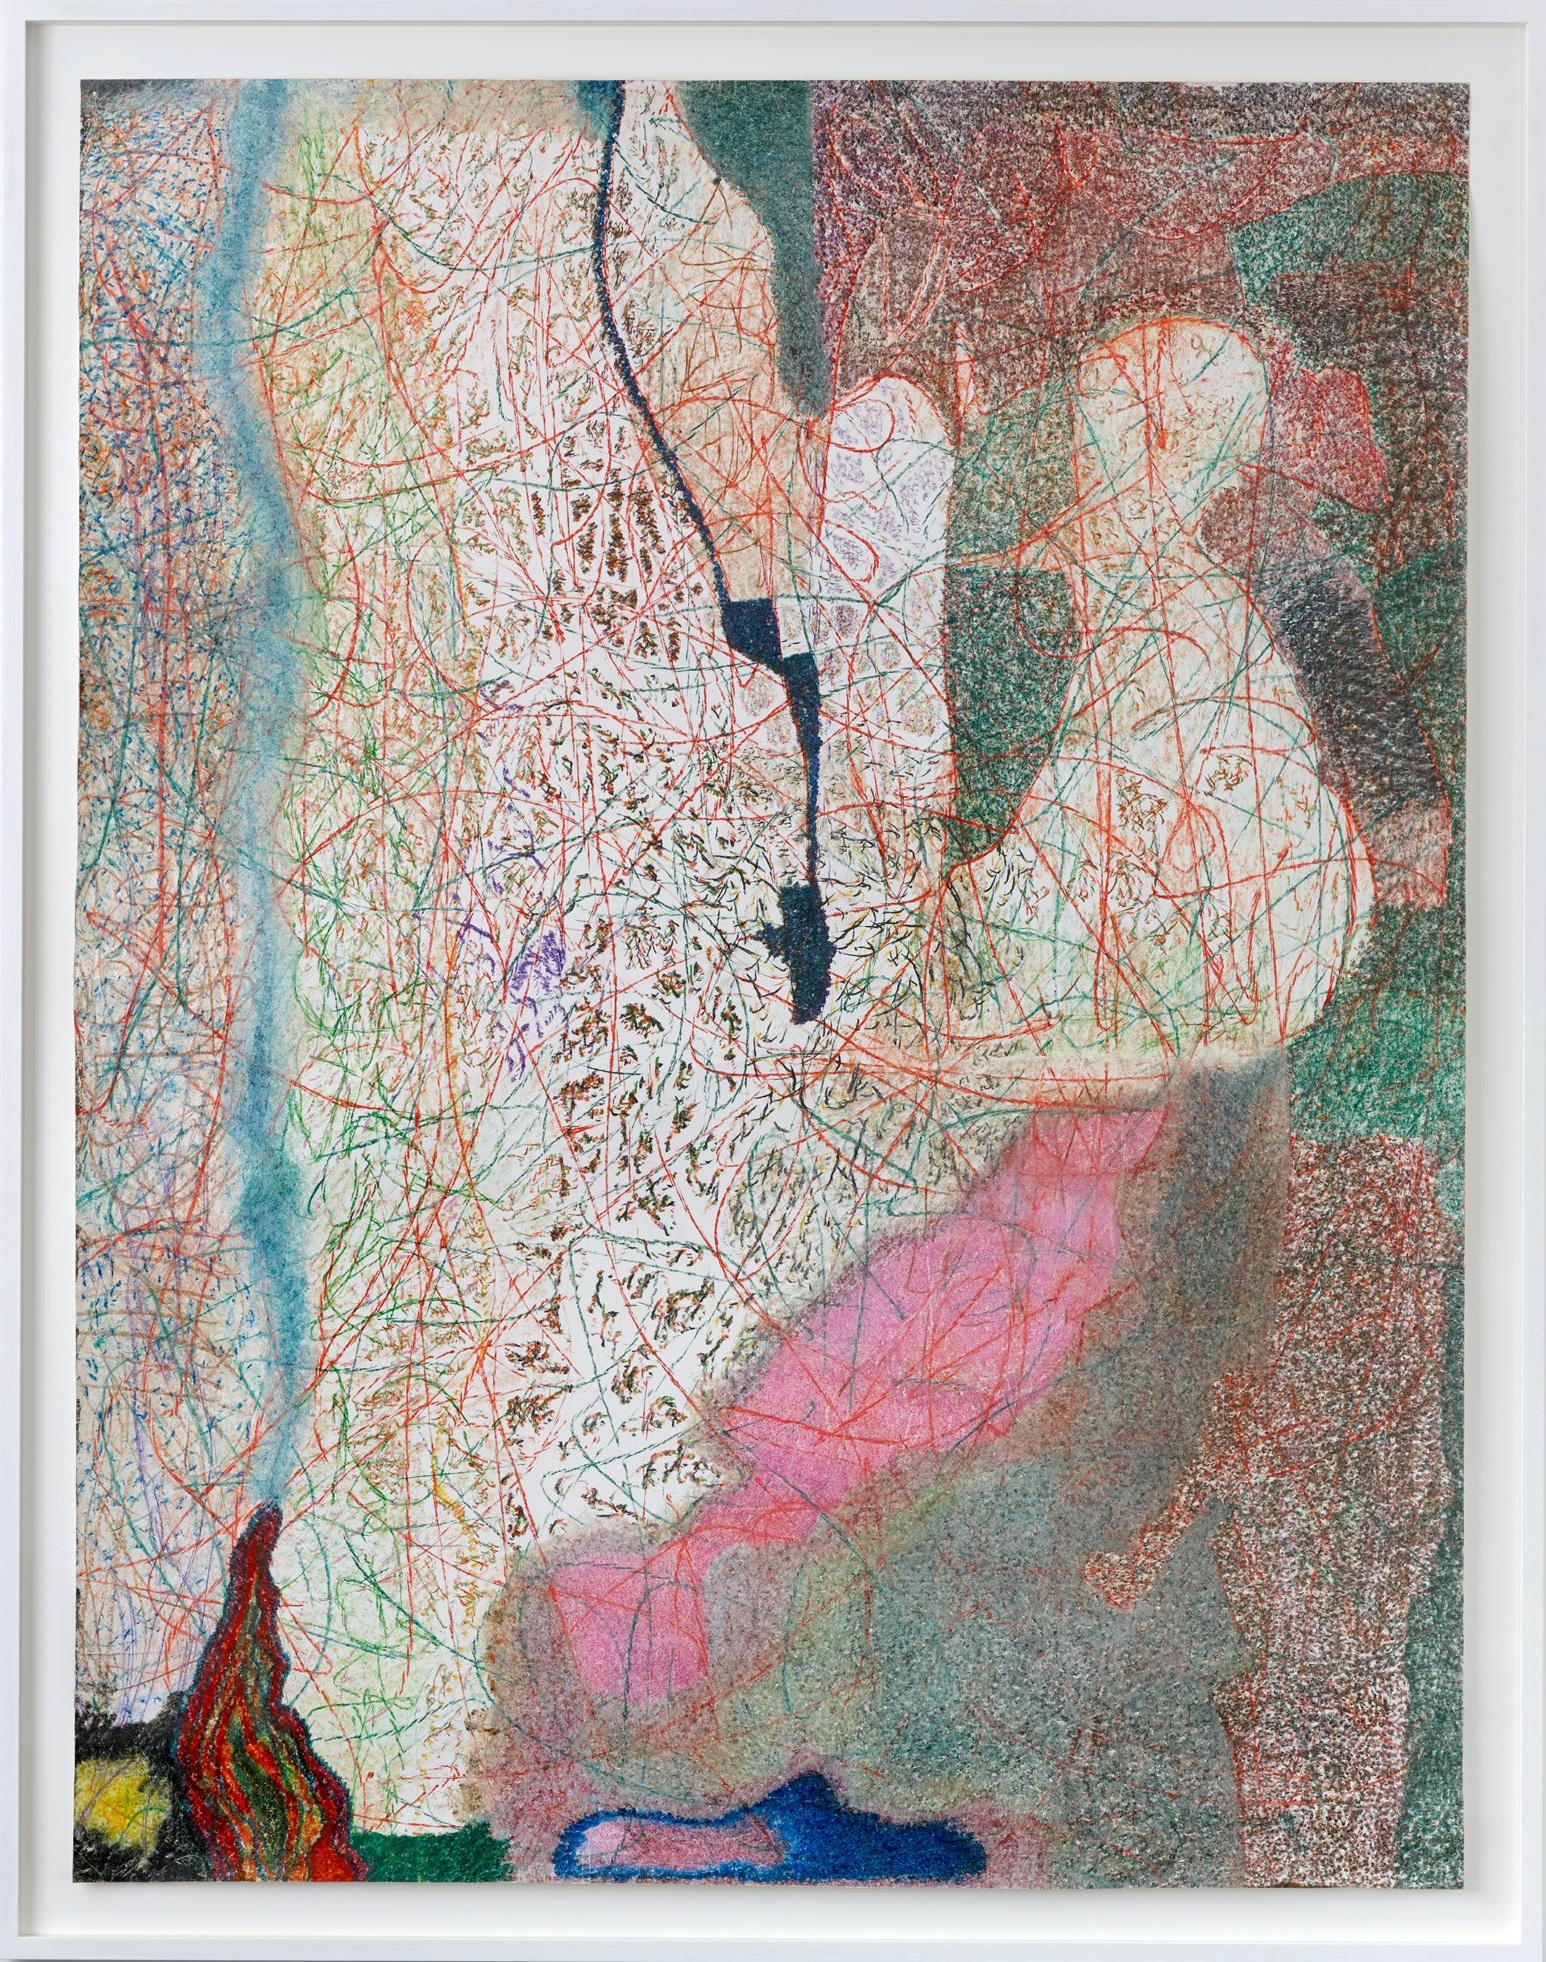 O.T. ( Come On Baby Light My Fire! ), 2017  Buntstift auf Papier, 150x180cm